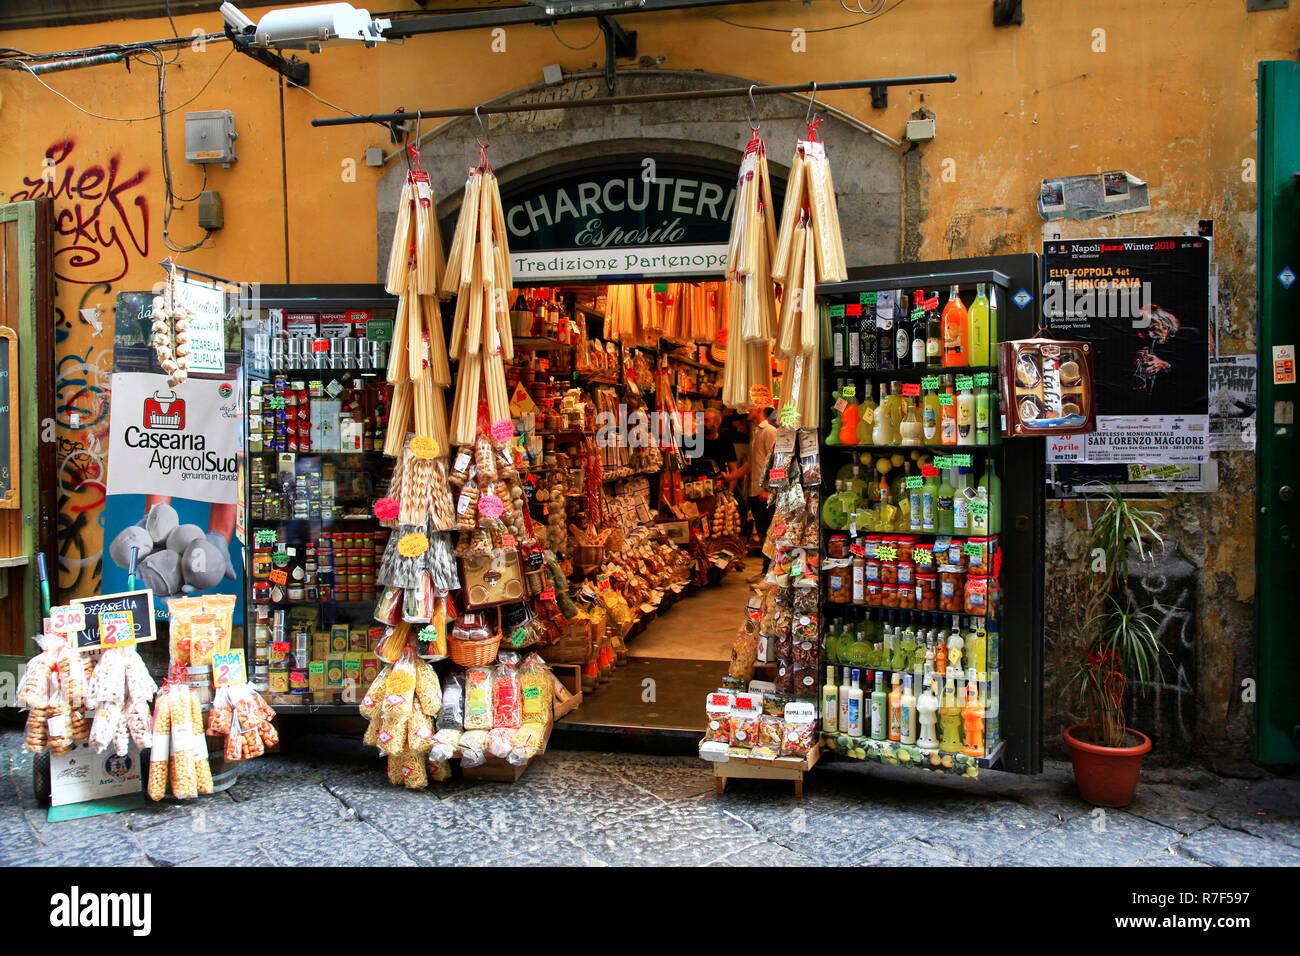 Pasta Shop im historischen Zentrum, Neapel, Capania, Italien Stockbild